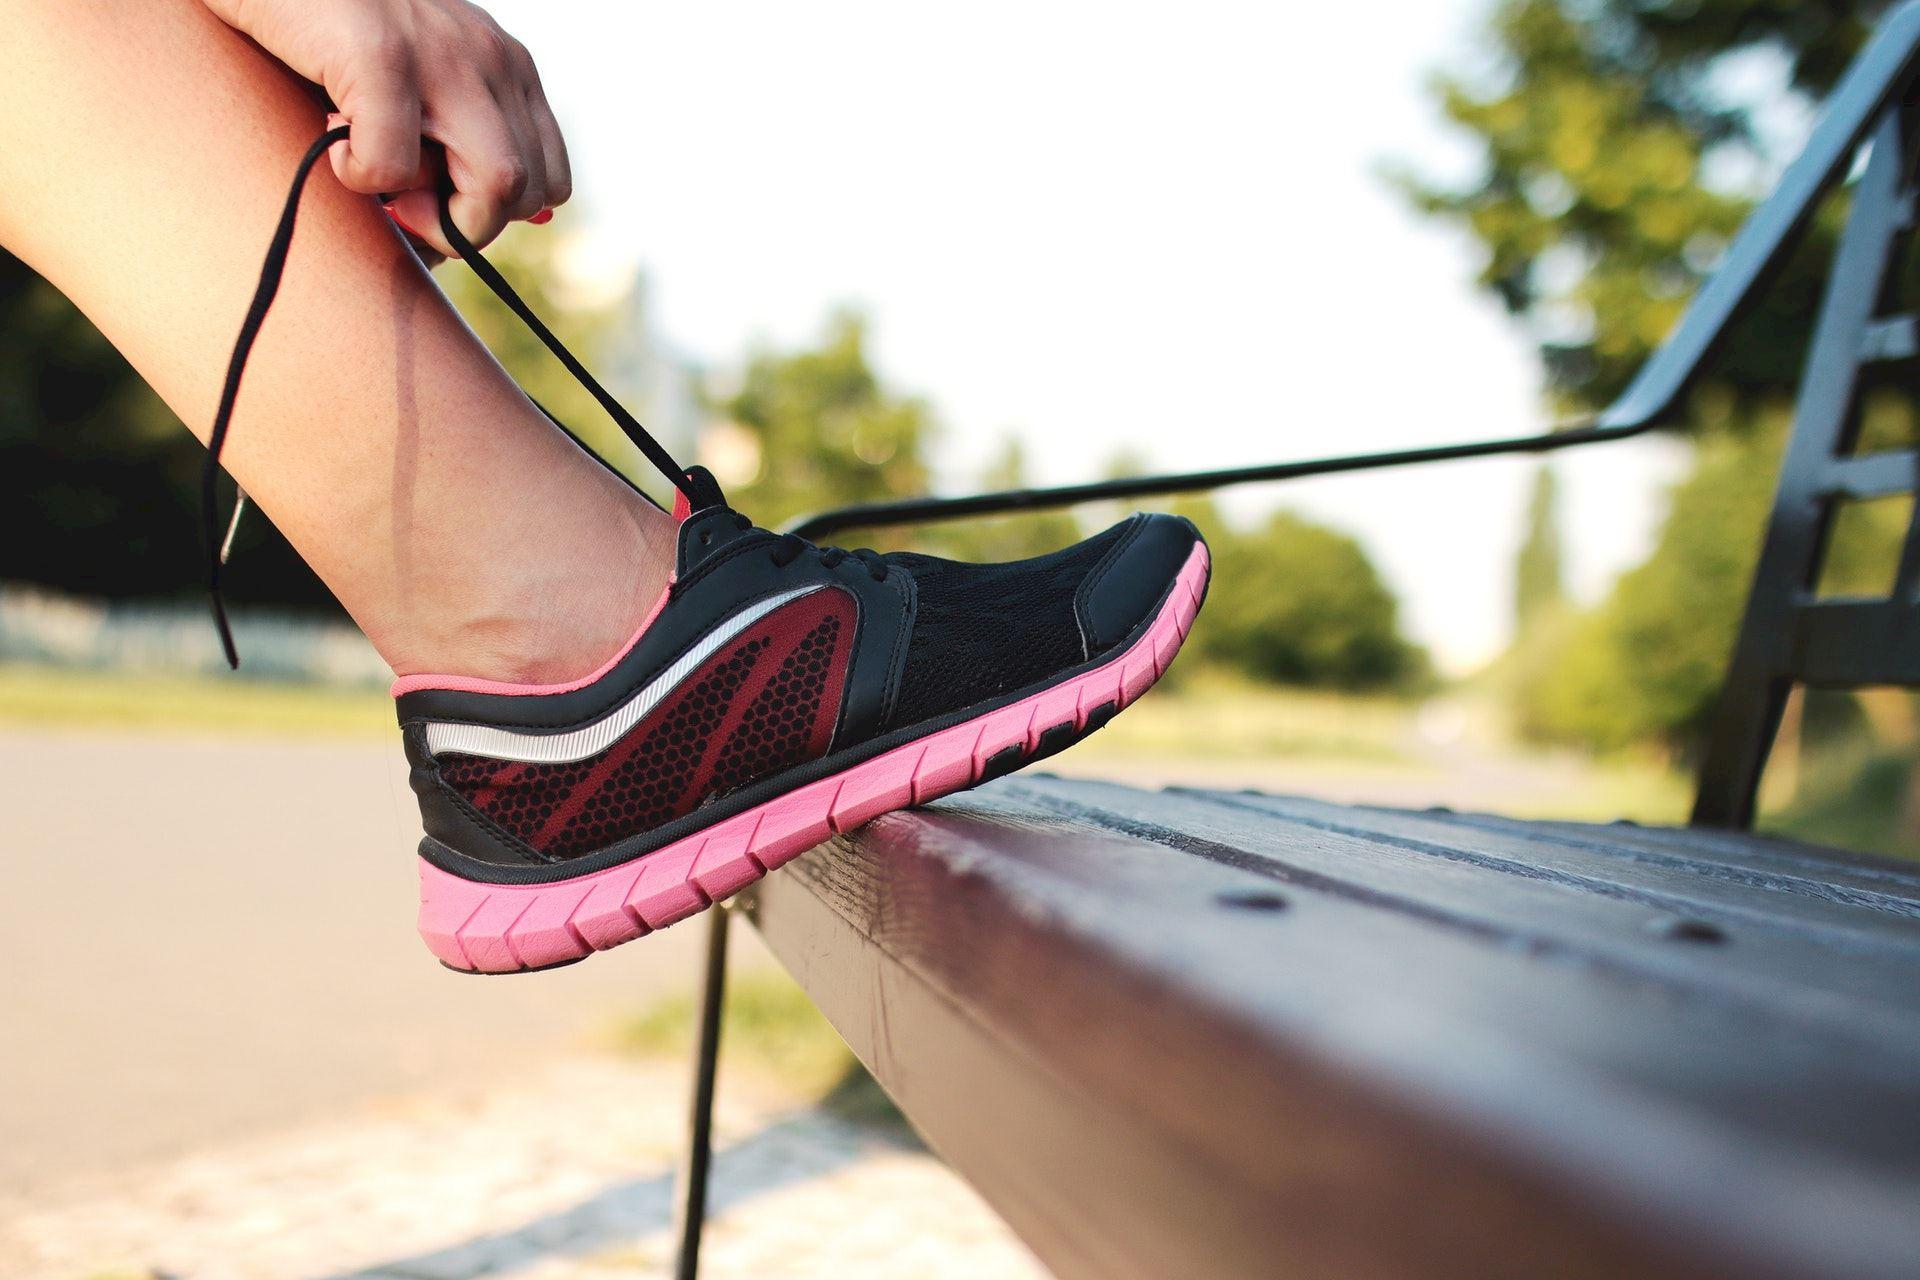 Marathon training with less injuries